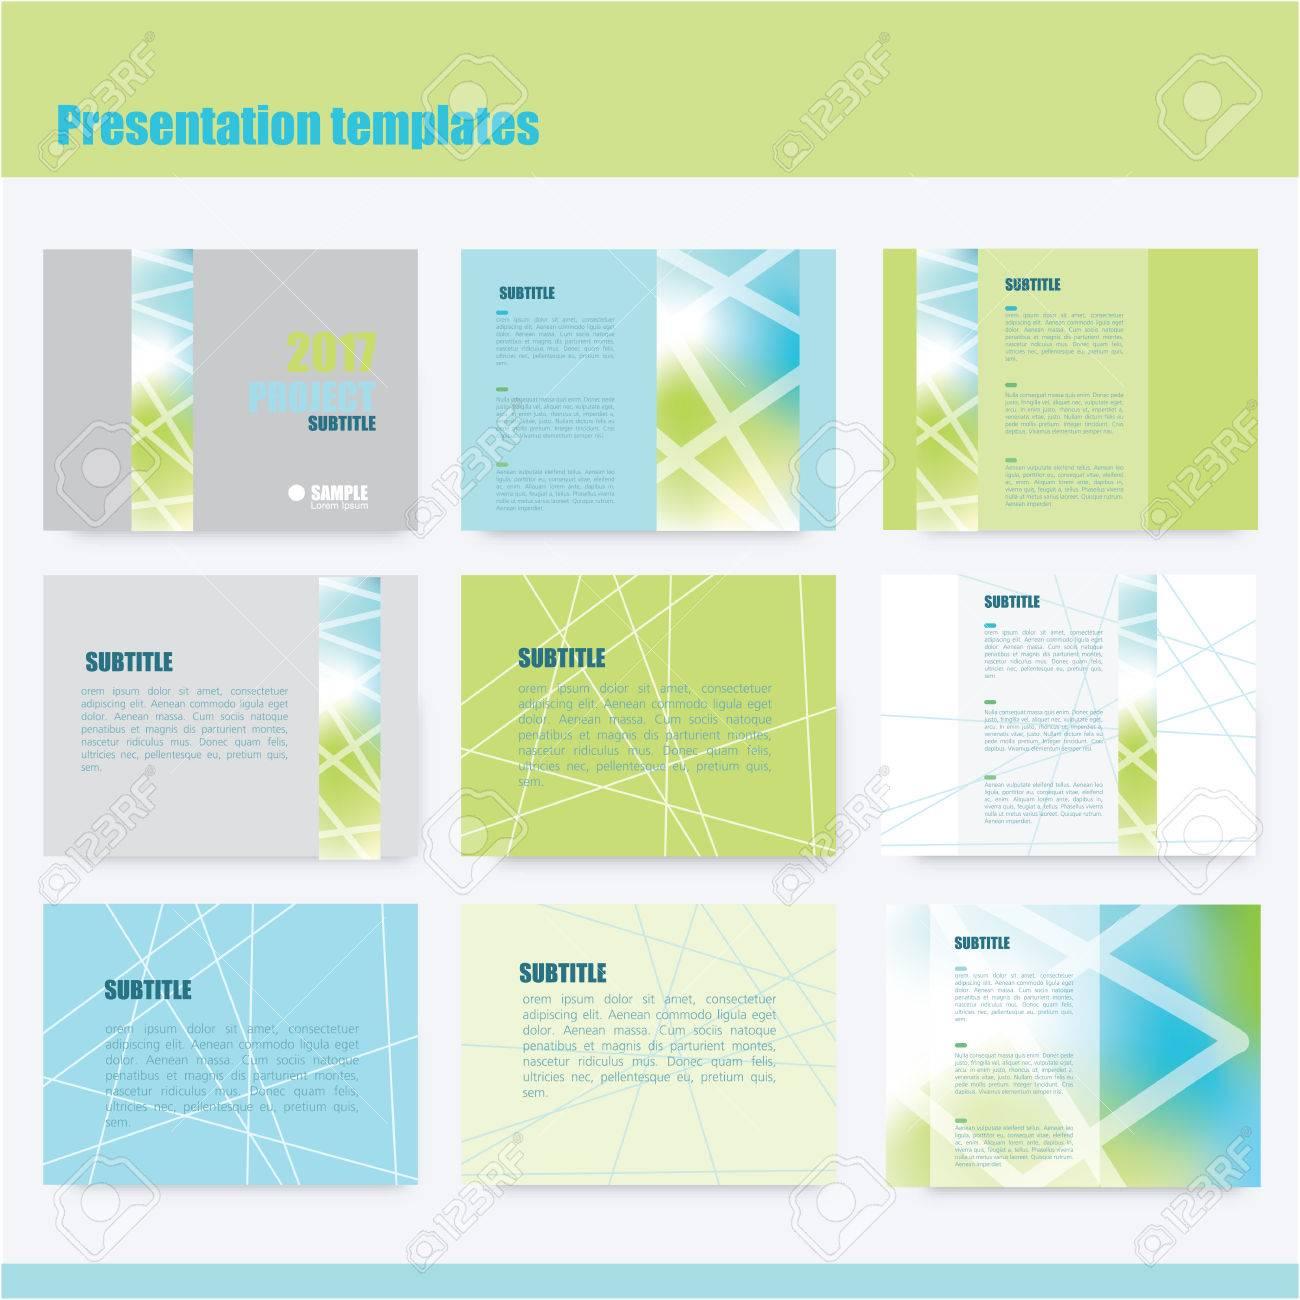 Business presentation slide templates - power point template design - 58018961